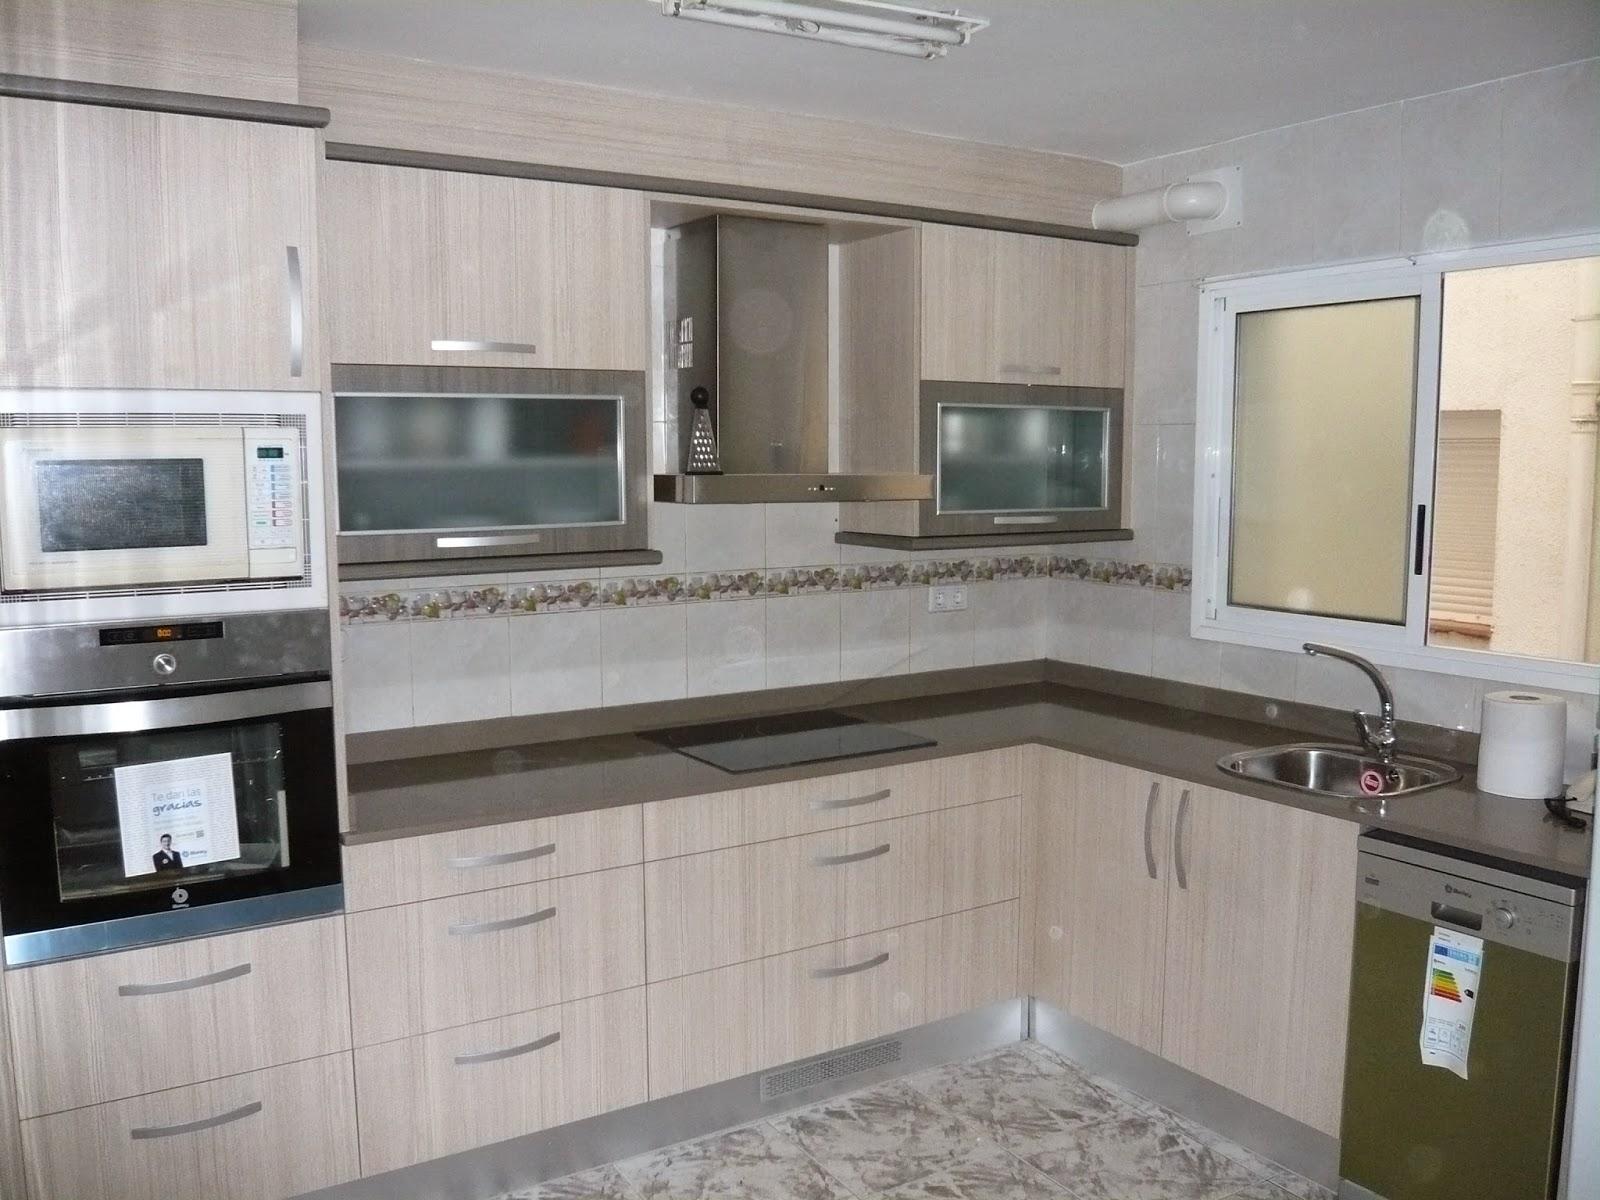 REUSCUINA: Muebles de cocina de formica beige